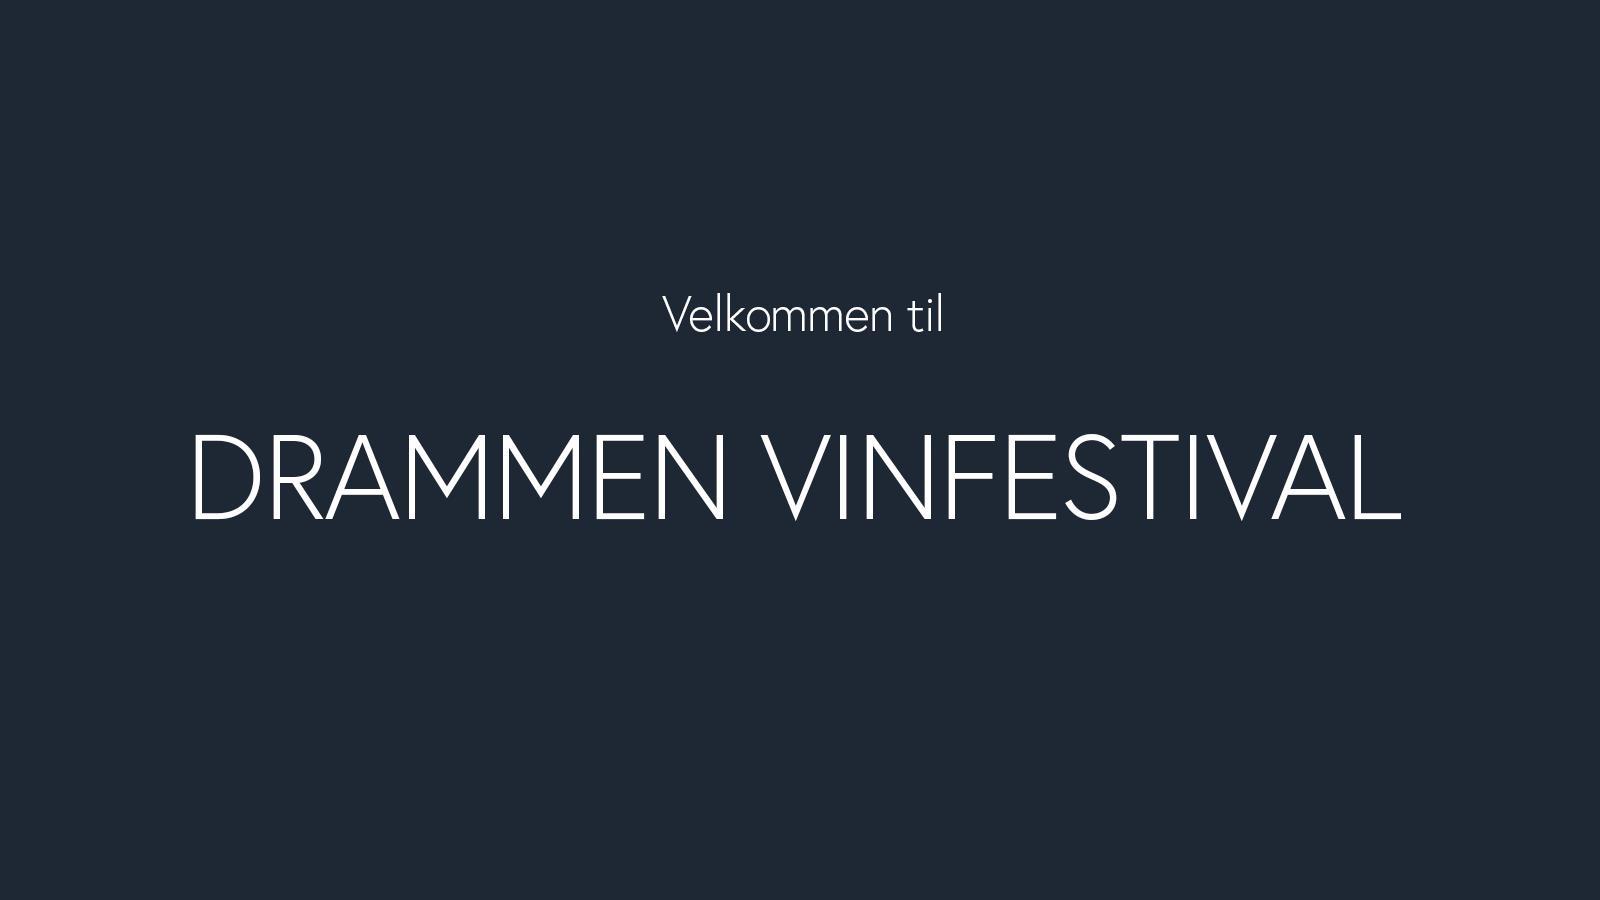 Drammen Vinfestival